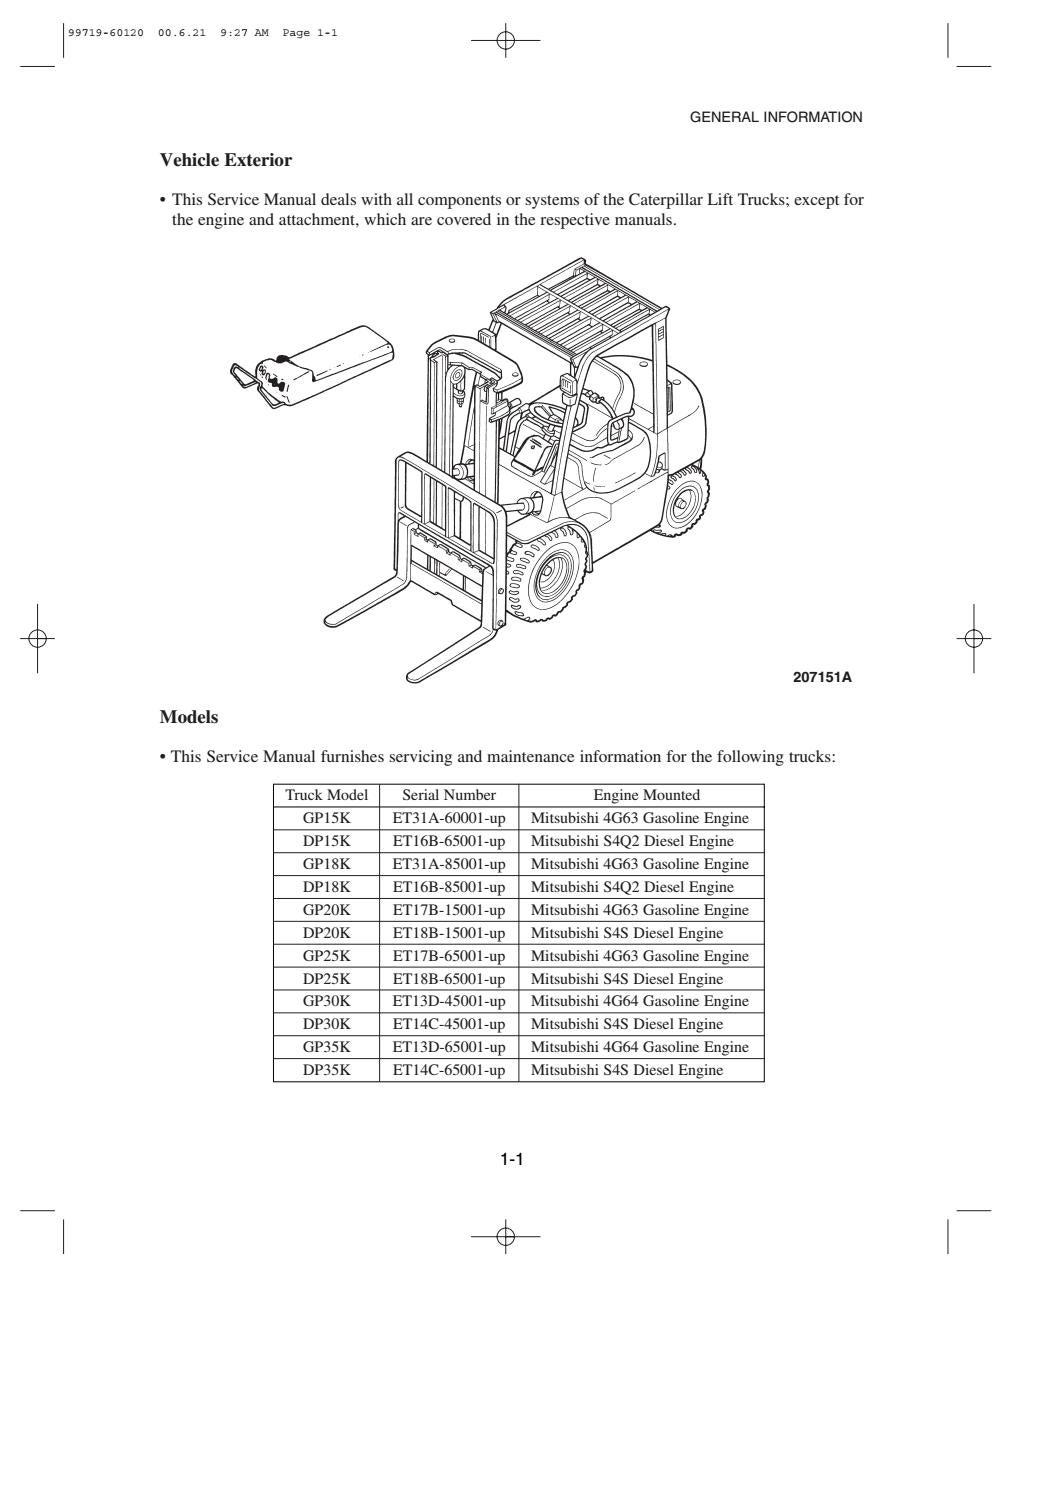 mitsubishi 4g63 engine diagram caterpillar cat dp30k fc forklift lift trucks service repair  caterpillar cat dp30k fc forklift lift